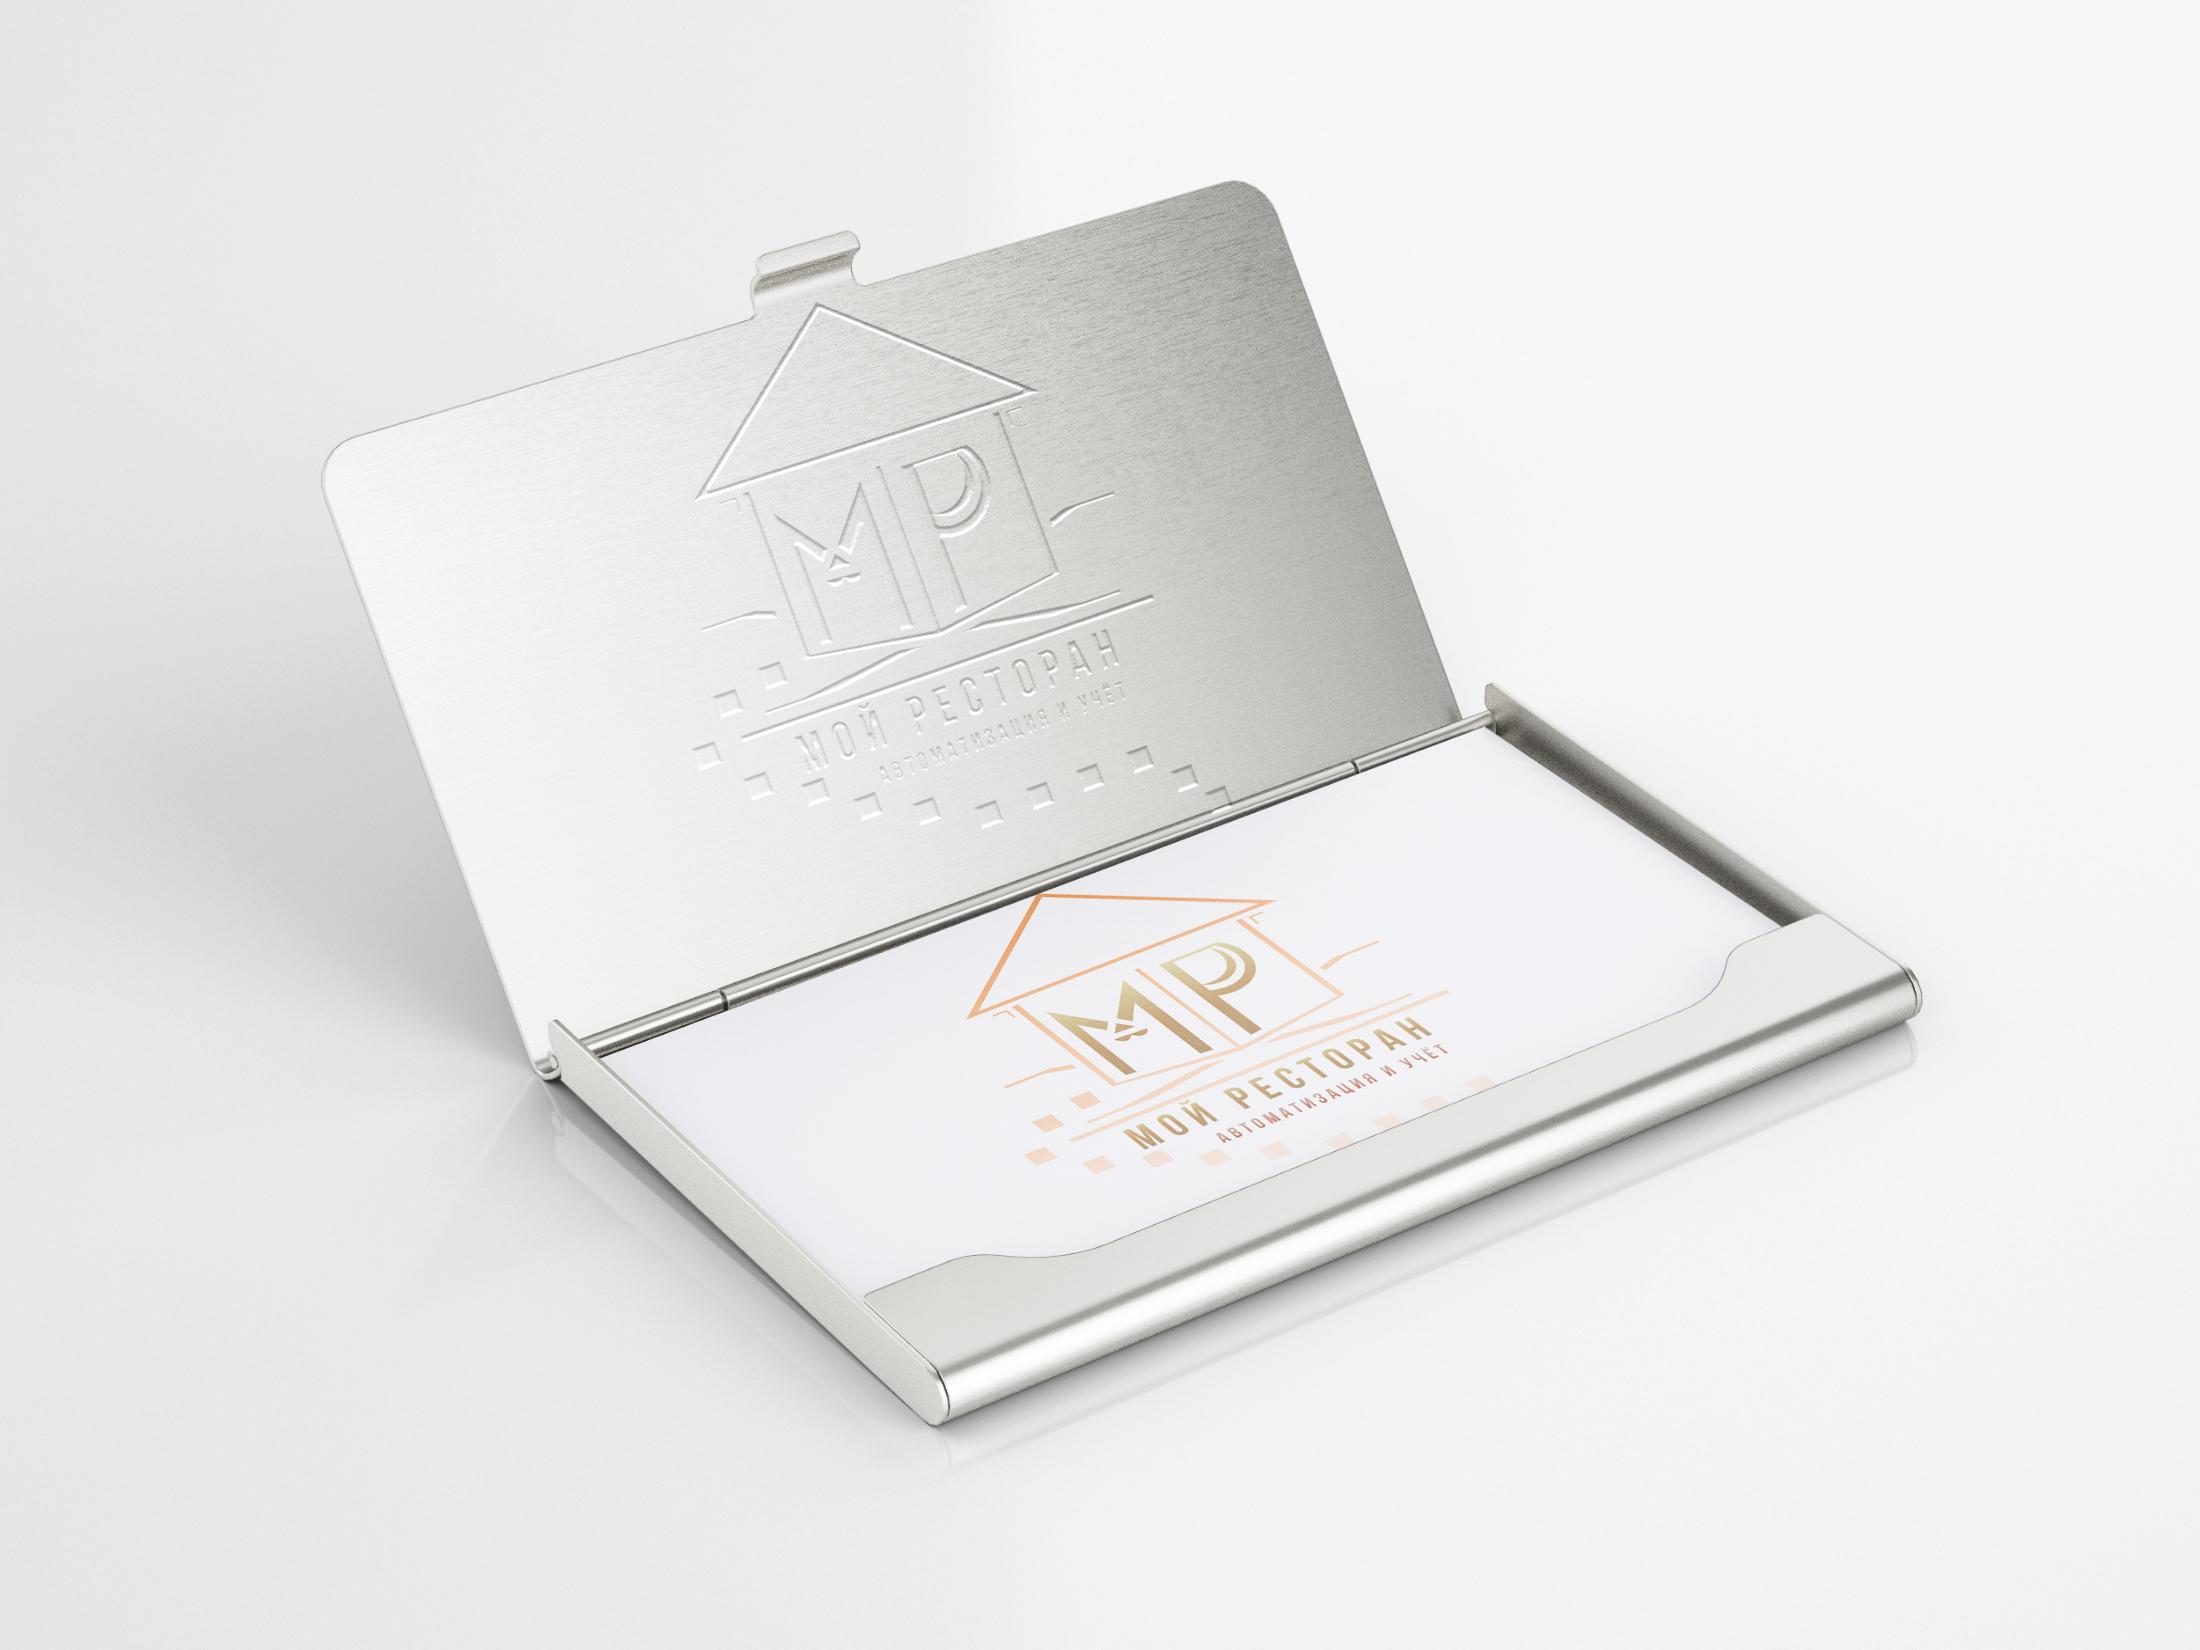 Разработать логотип и фавикон для IT- компании фото f_8225d544cd594986.jpg